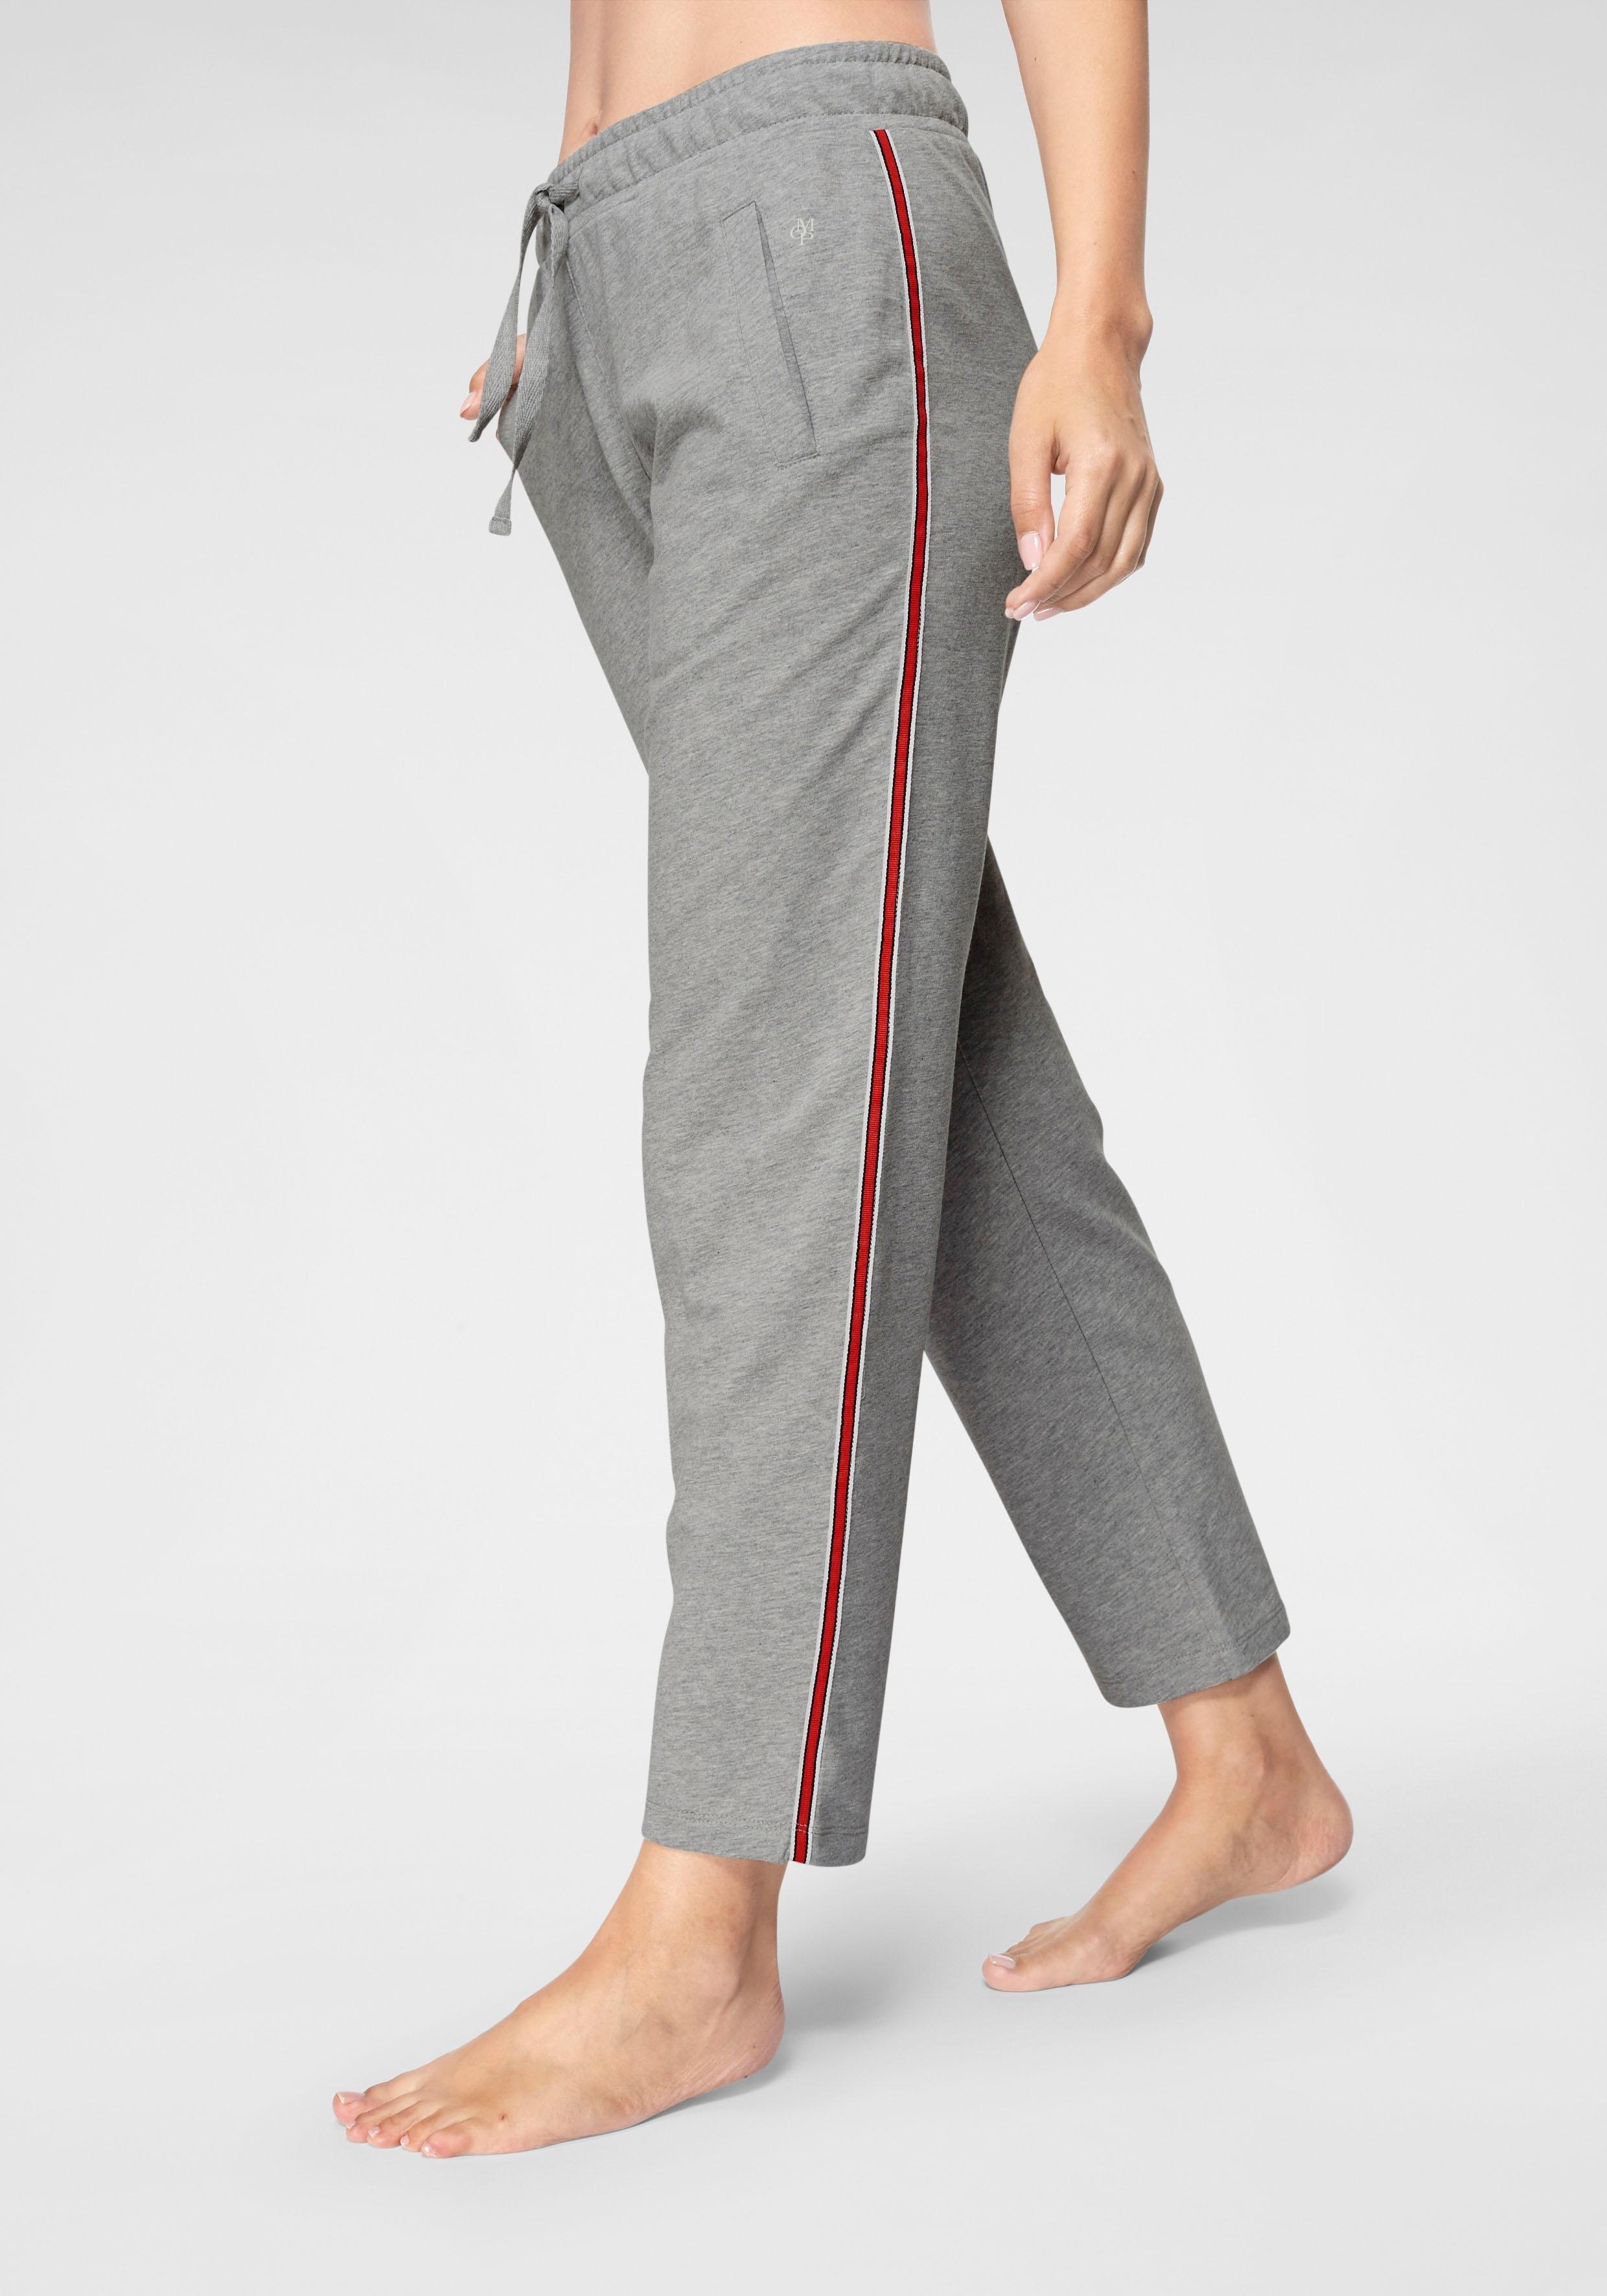 Marc O'Polo pyjamabroek bij Lascana online kopen